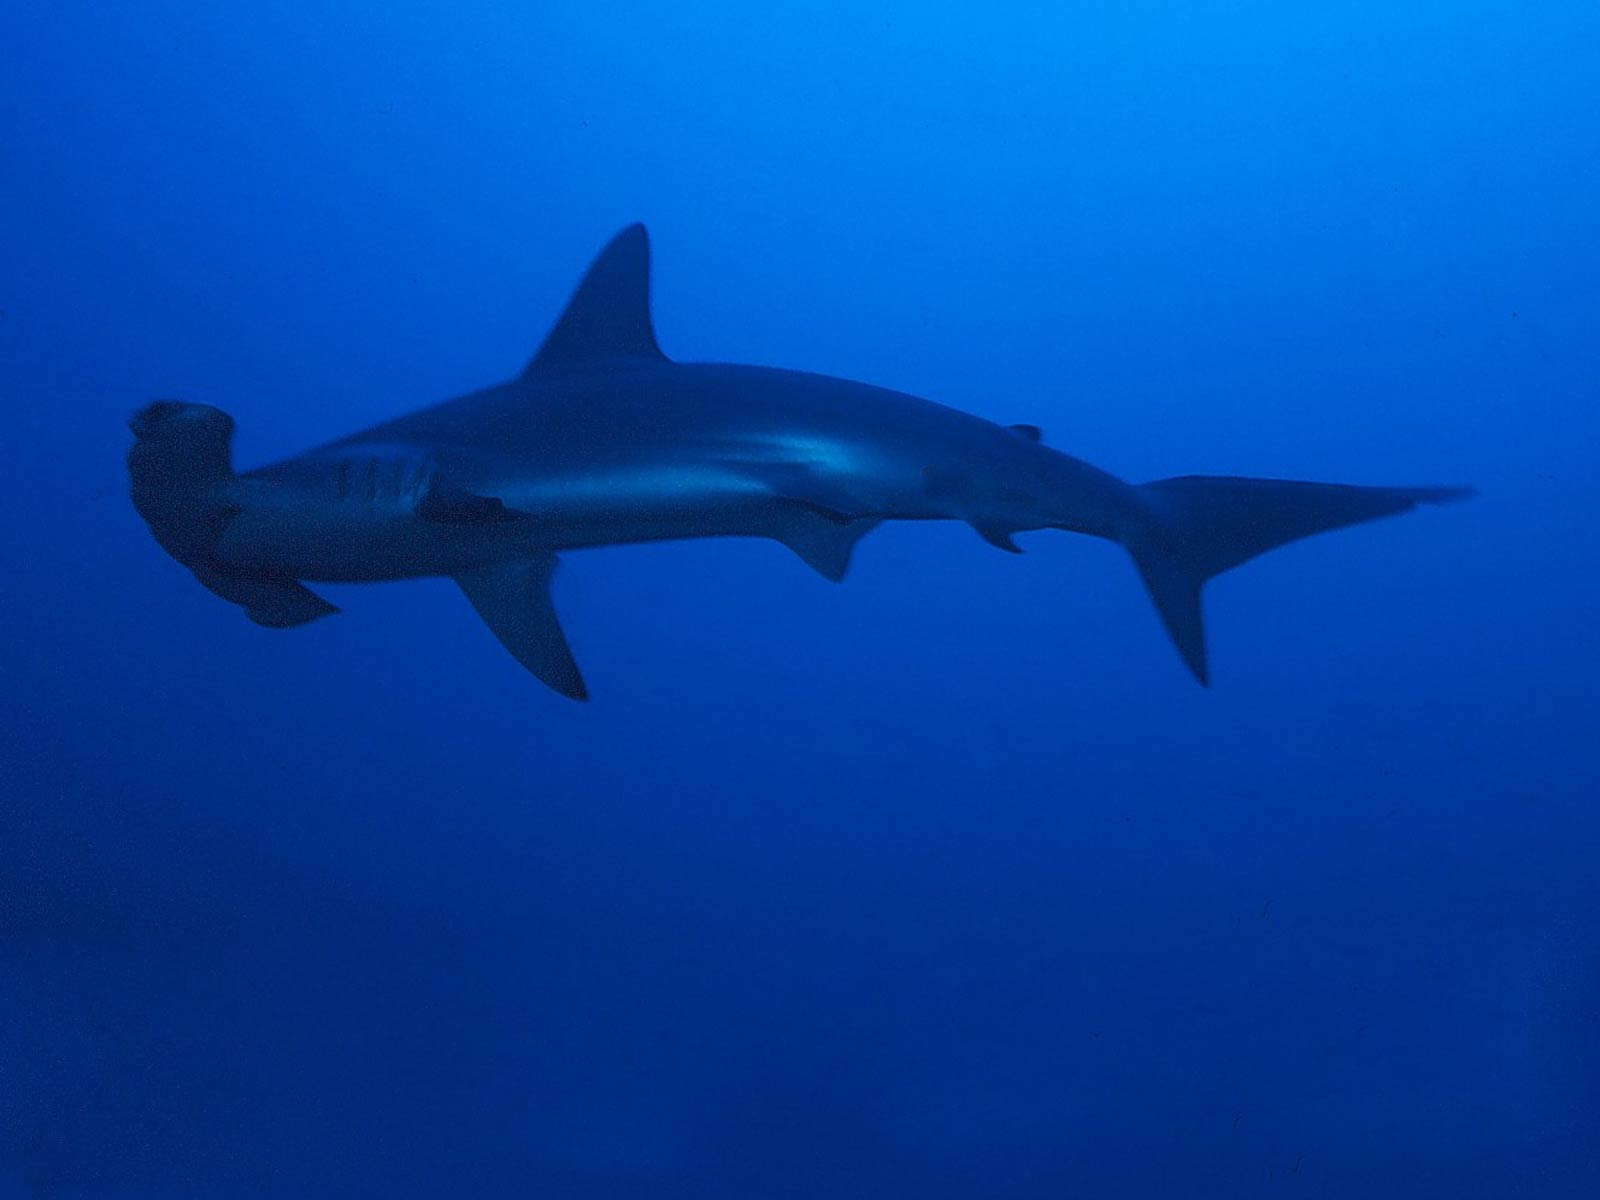 free hammerhead shark wallpaper download animals town